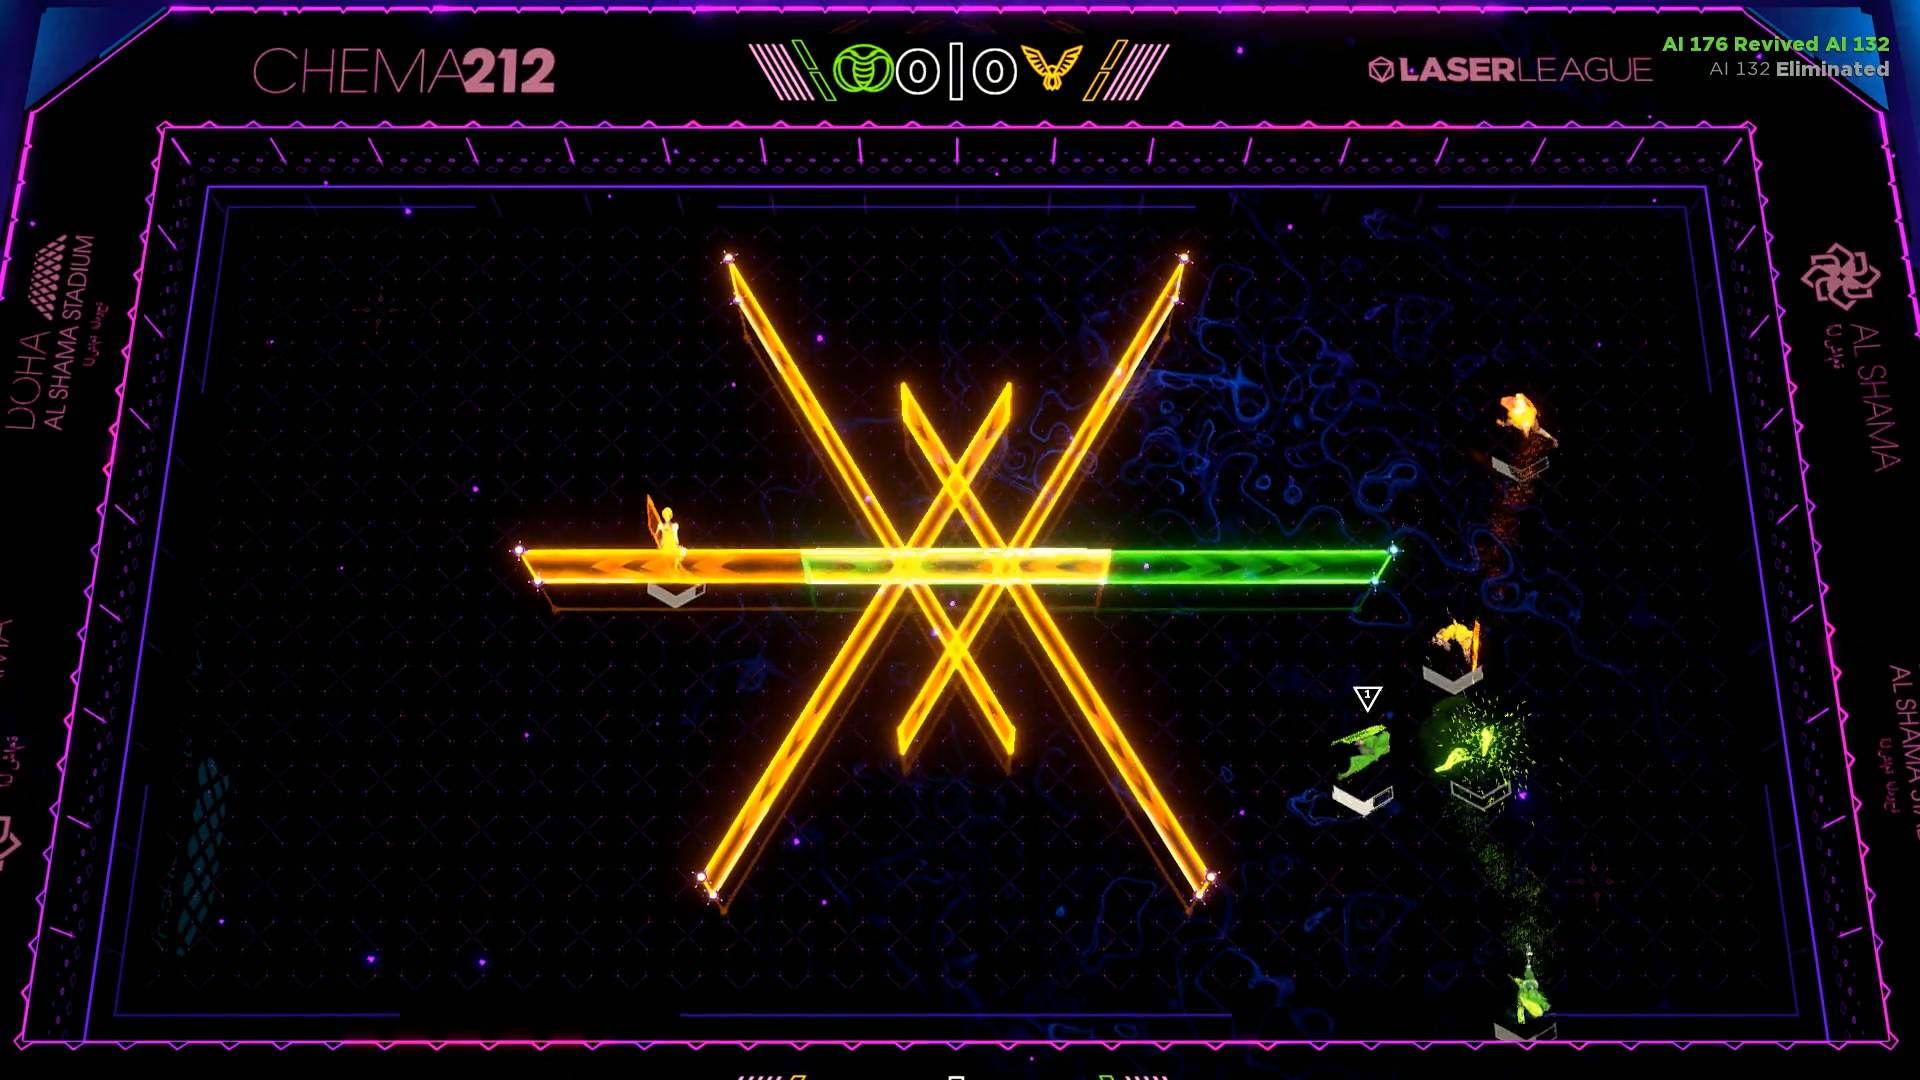 laserleague_march18updateimages_0006